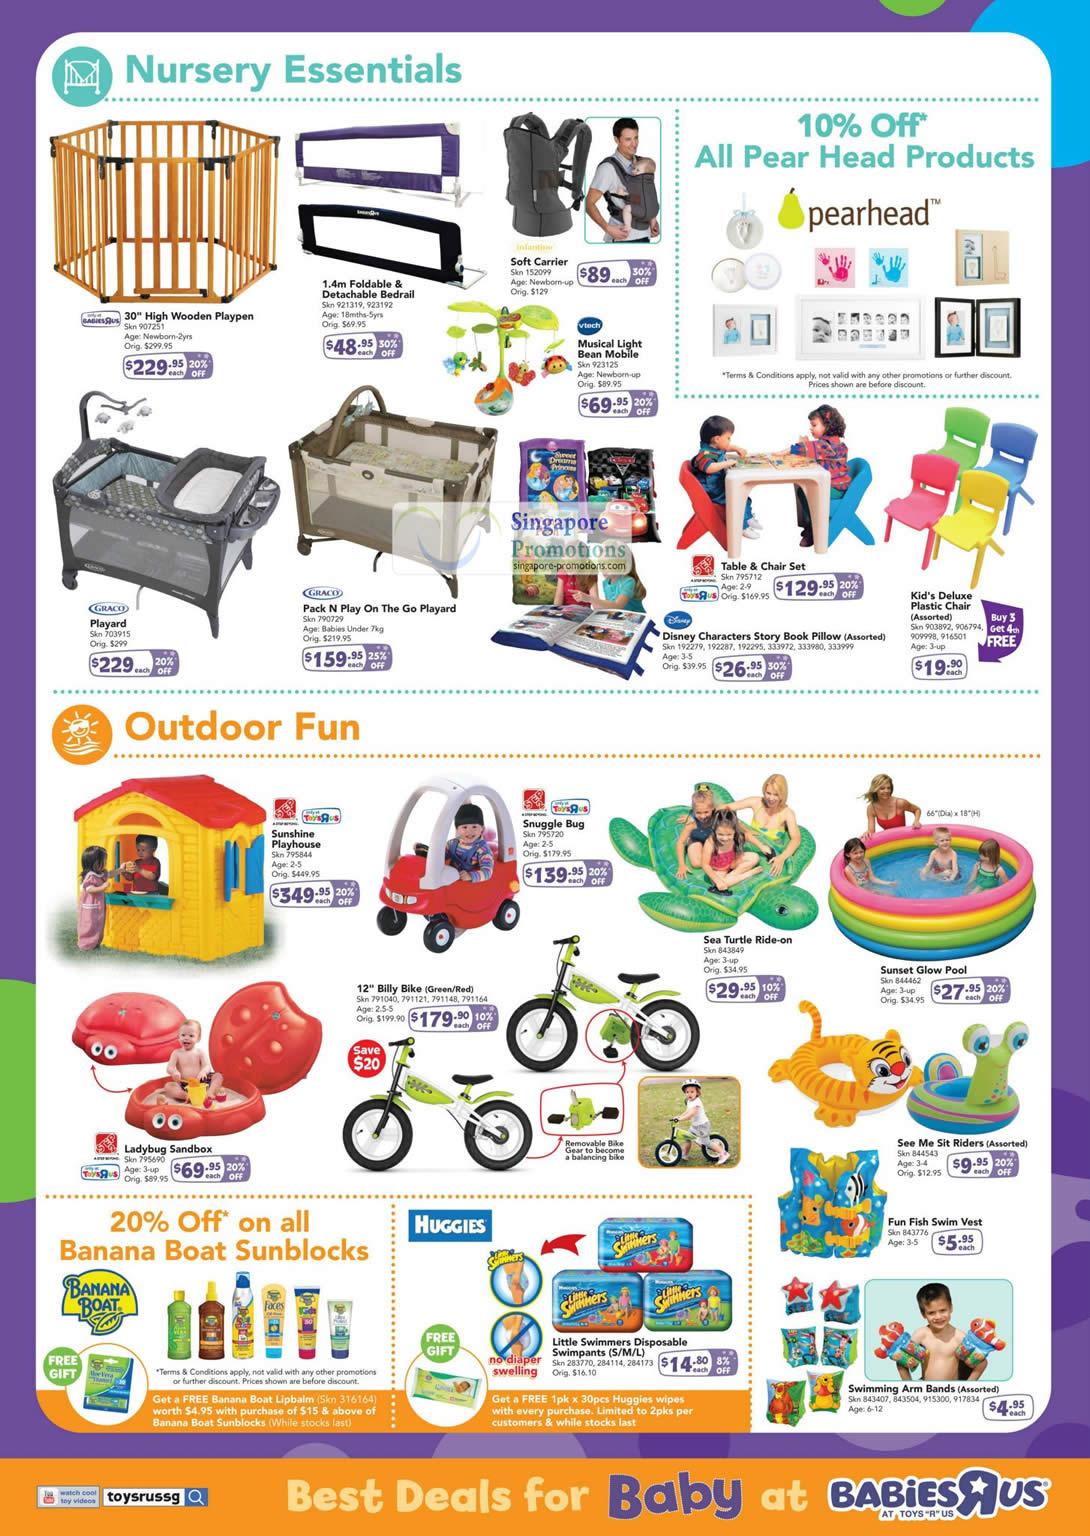 Nursery Essentials, Outdoor Fun